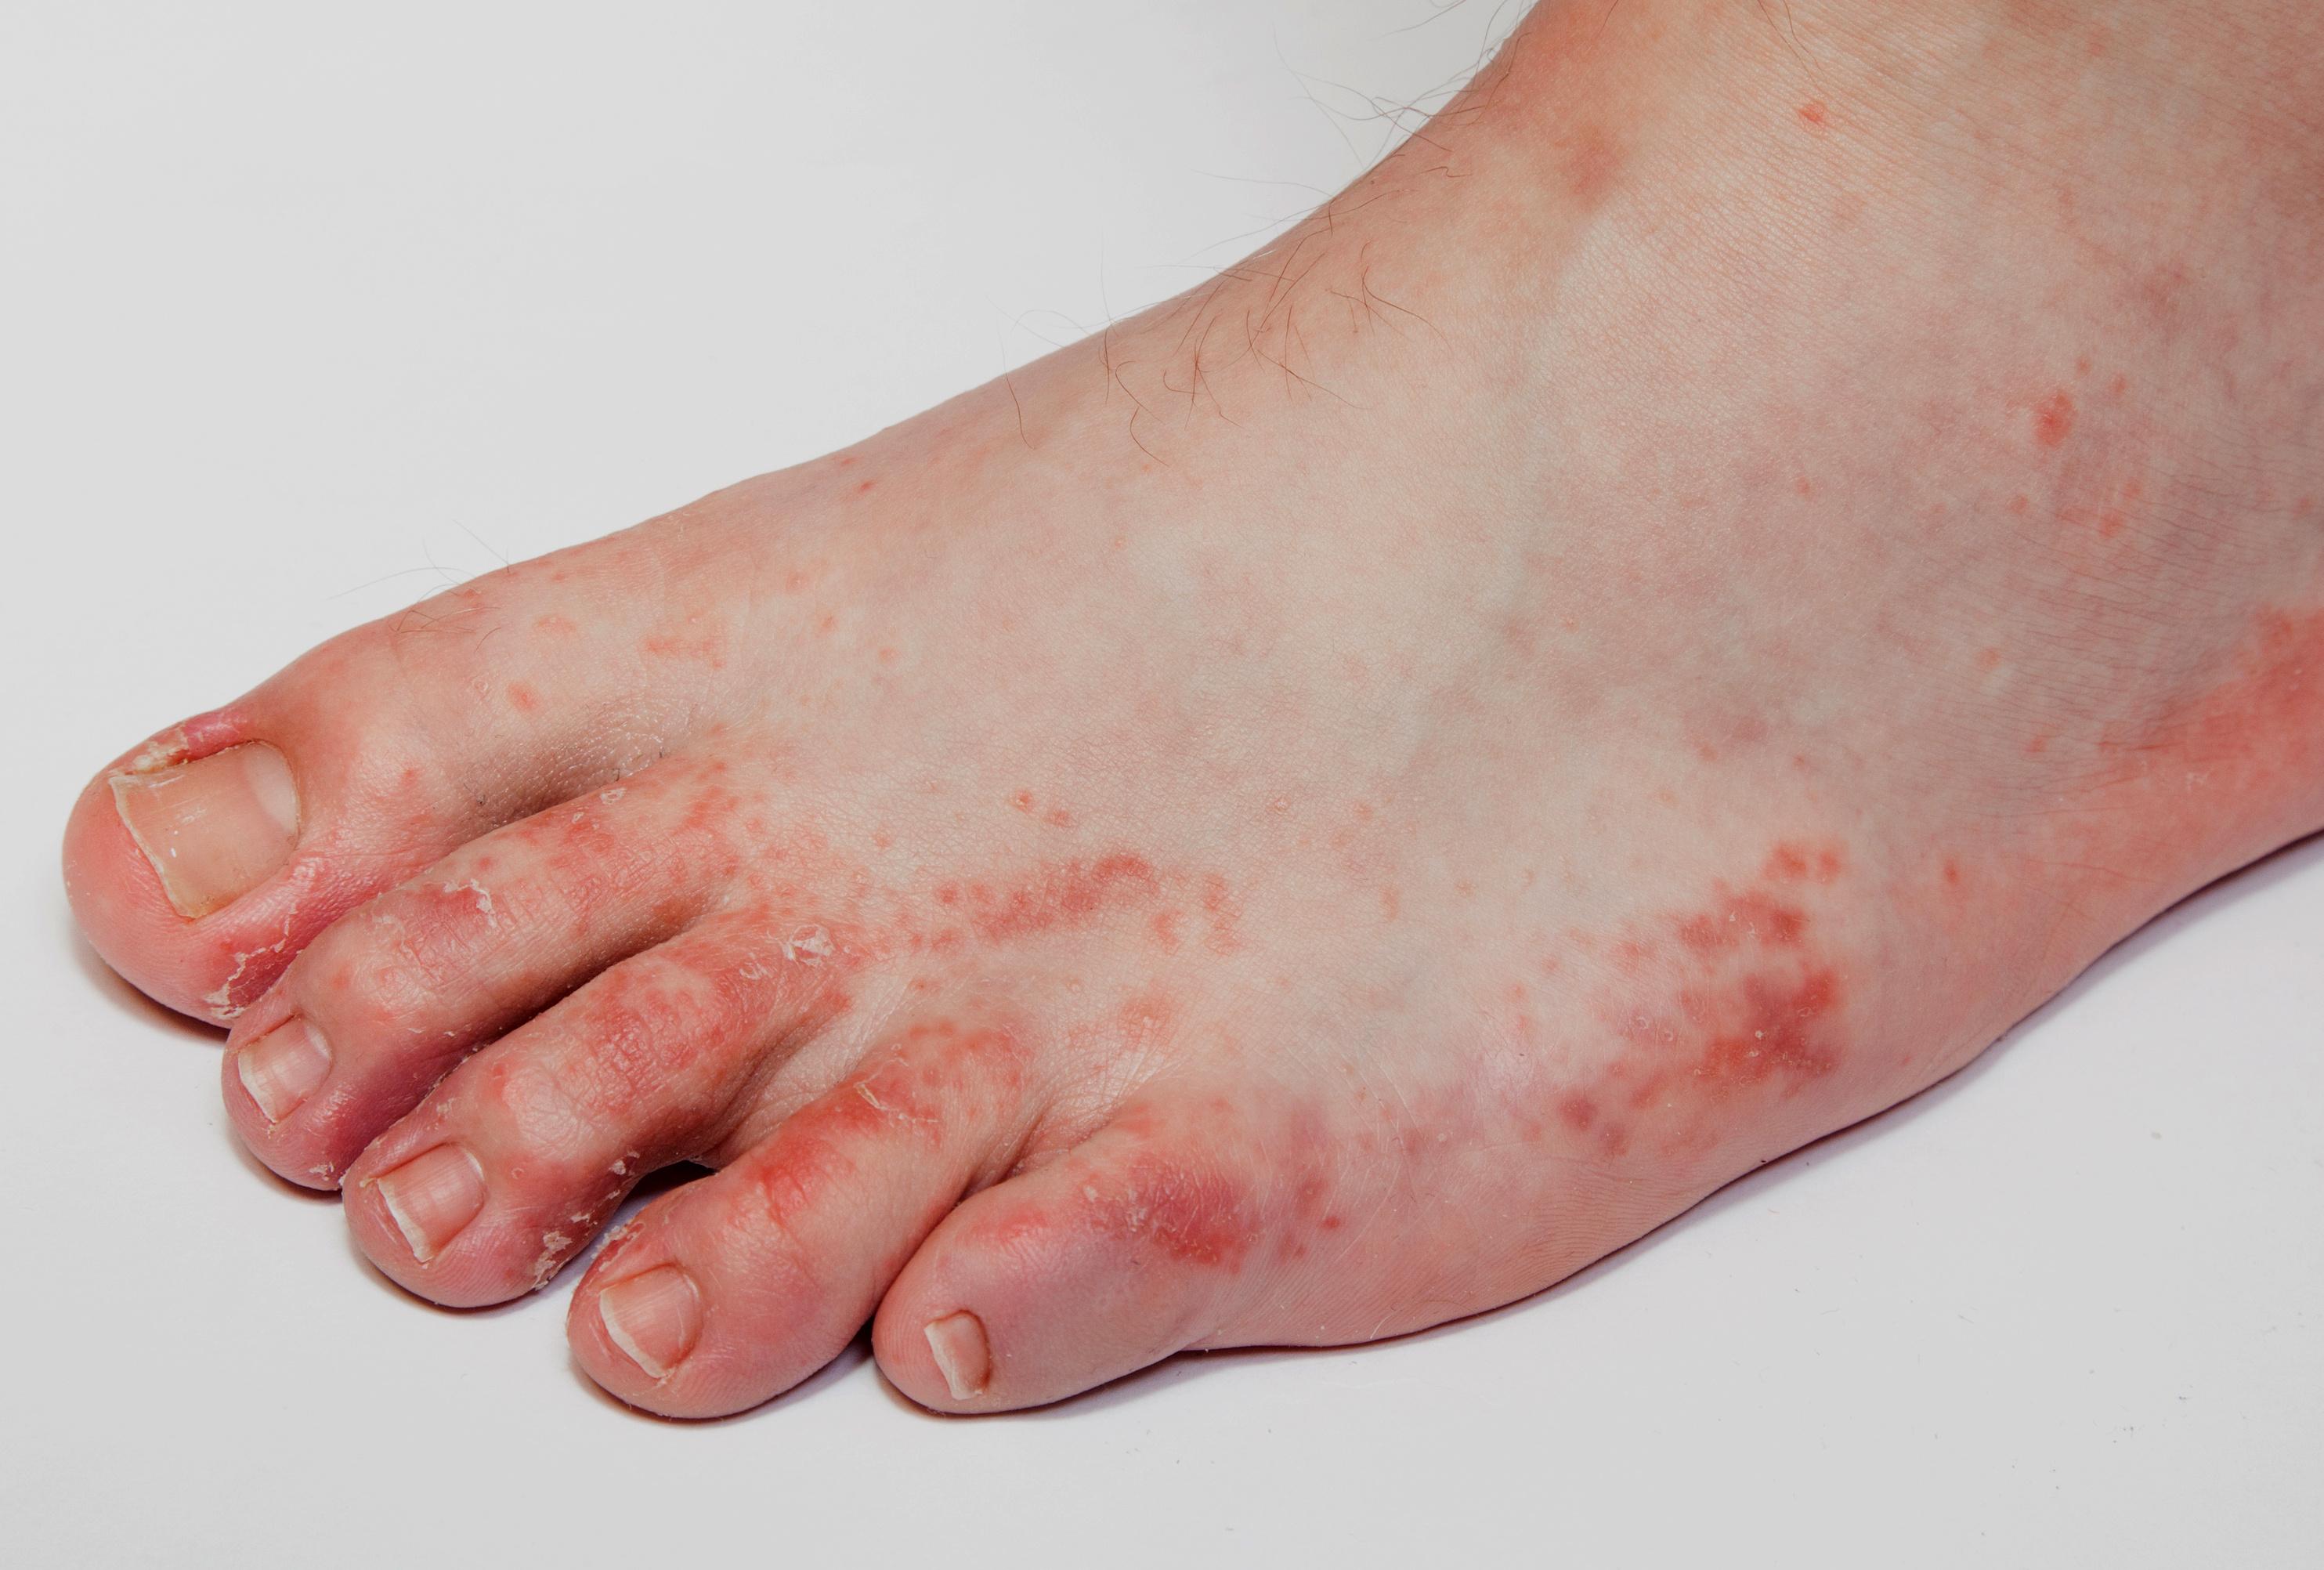 hámló bőr a lábakon vörös foltok psoriasis and crohns disease